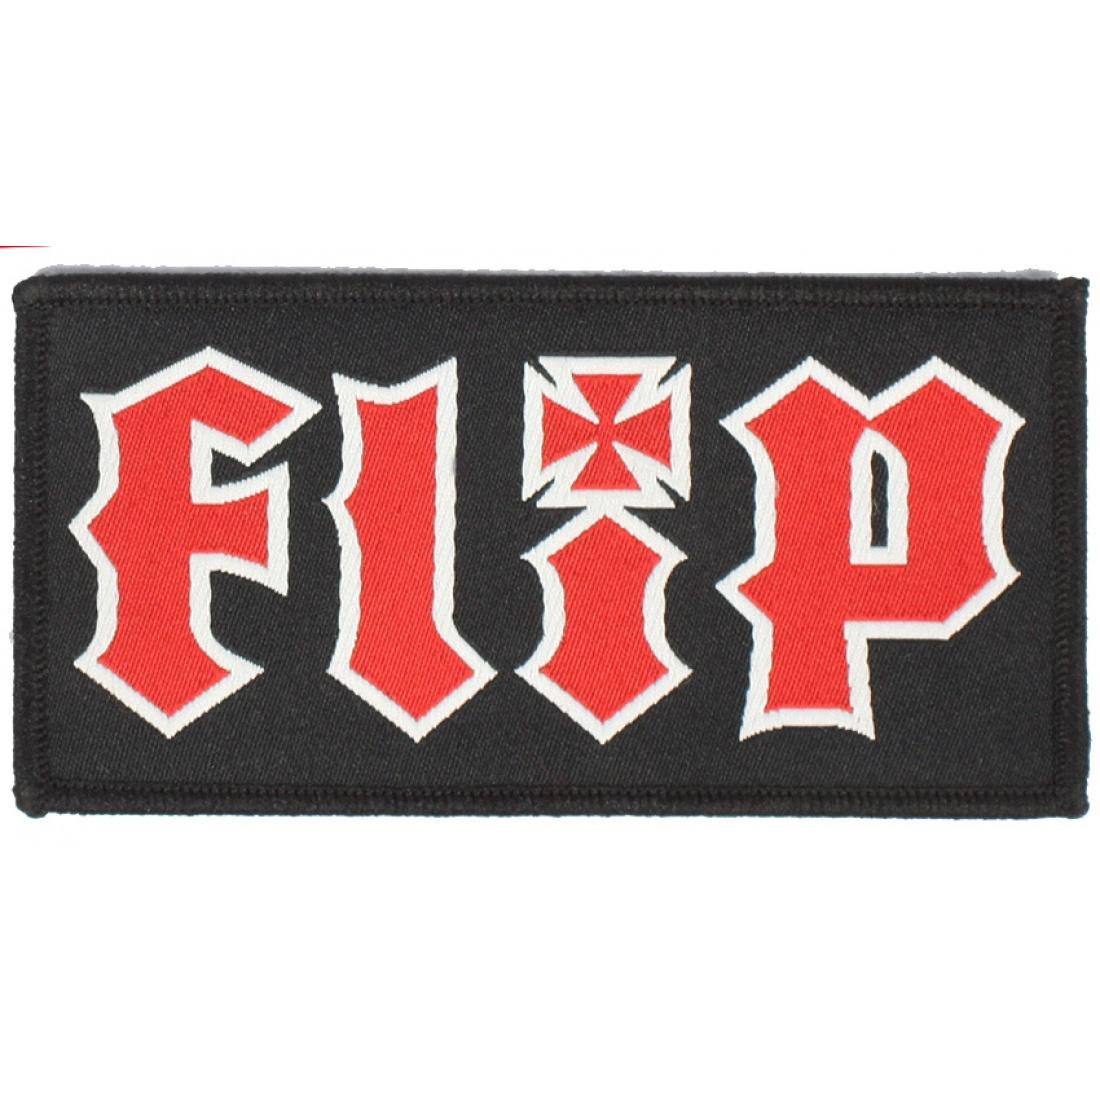 FLP-HKD Logo Patch